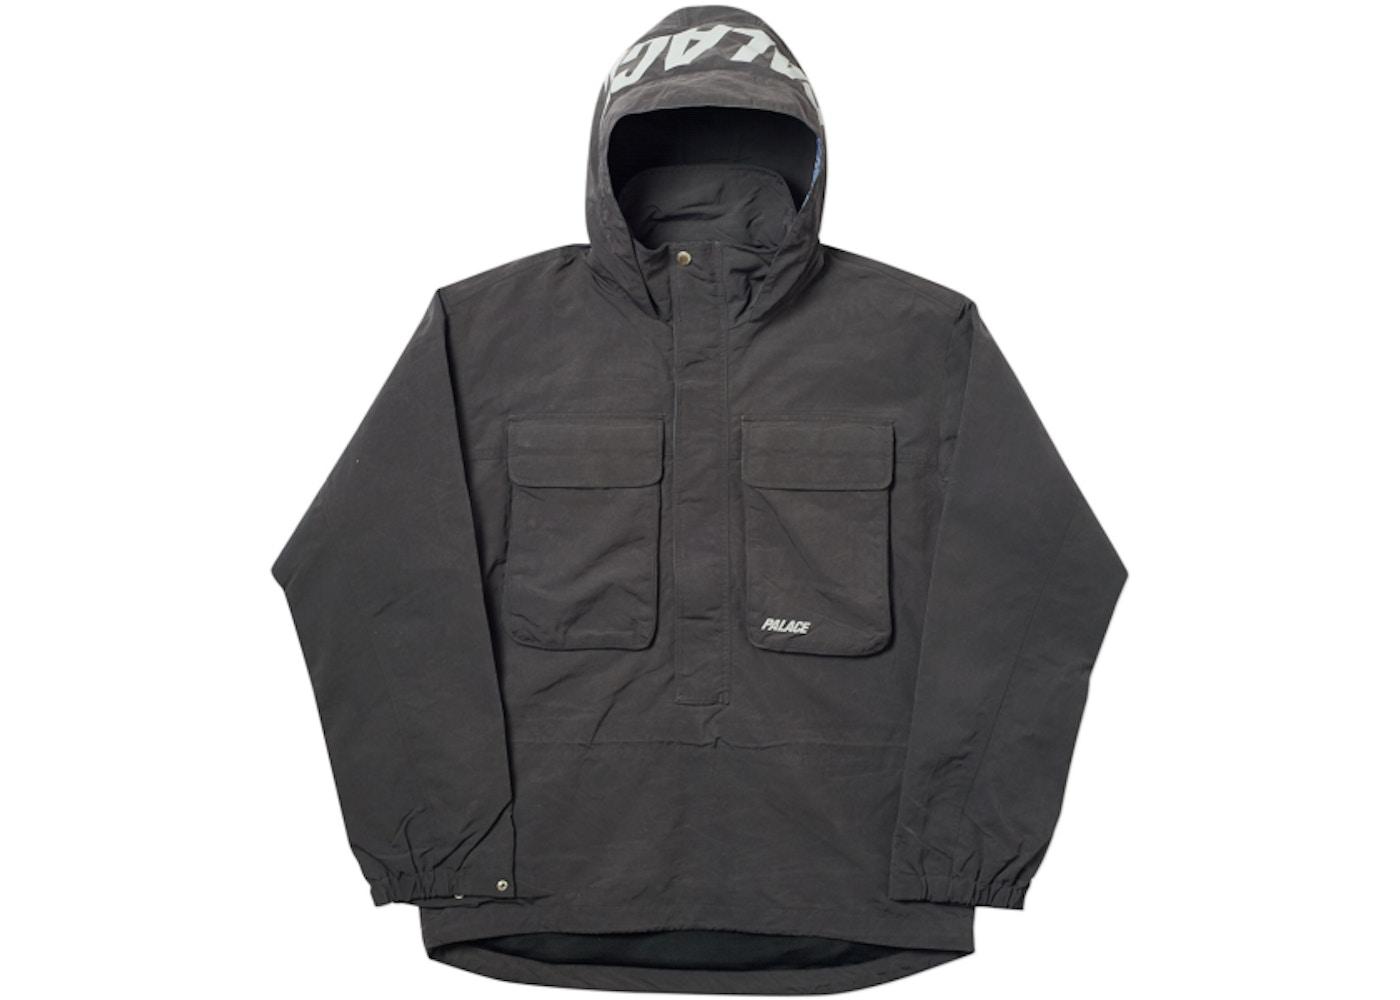 b99a21e98b06 Palace Bello Jacket Dark Grey - FW18